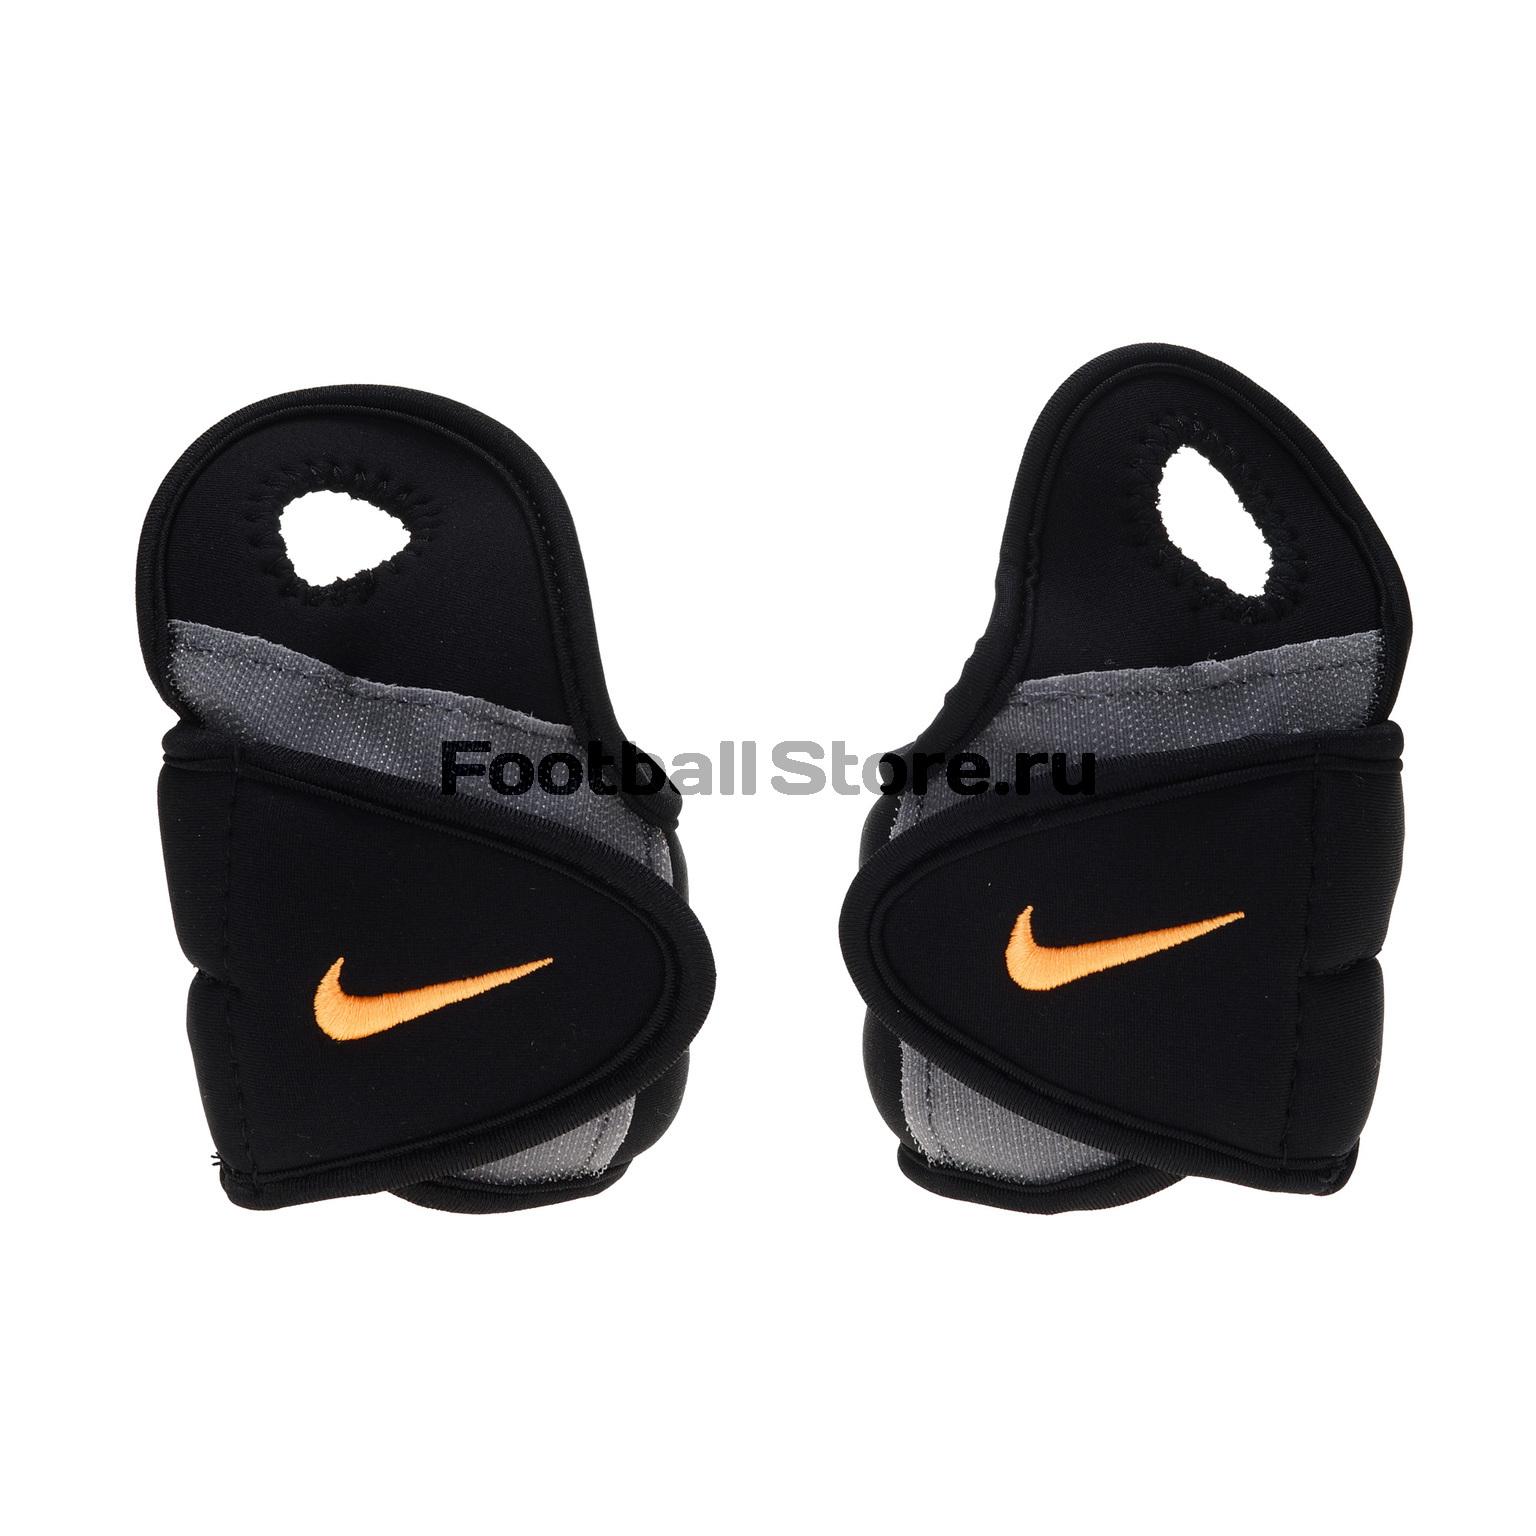 Утяжелитель на руку Nike WRIST Weights 1LB N.EX.06.087.OS 10kg adjustable ankle wrist weights